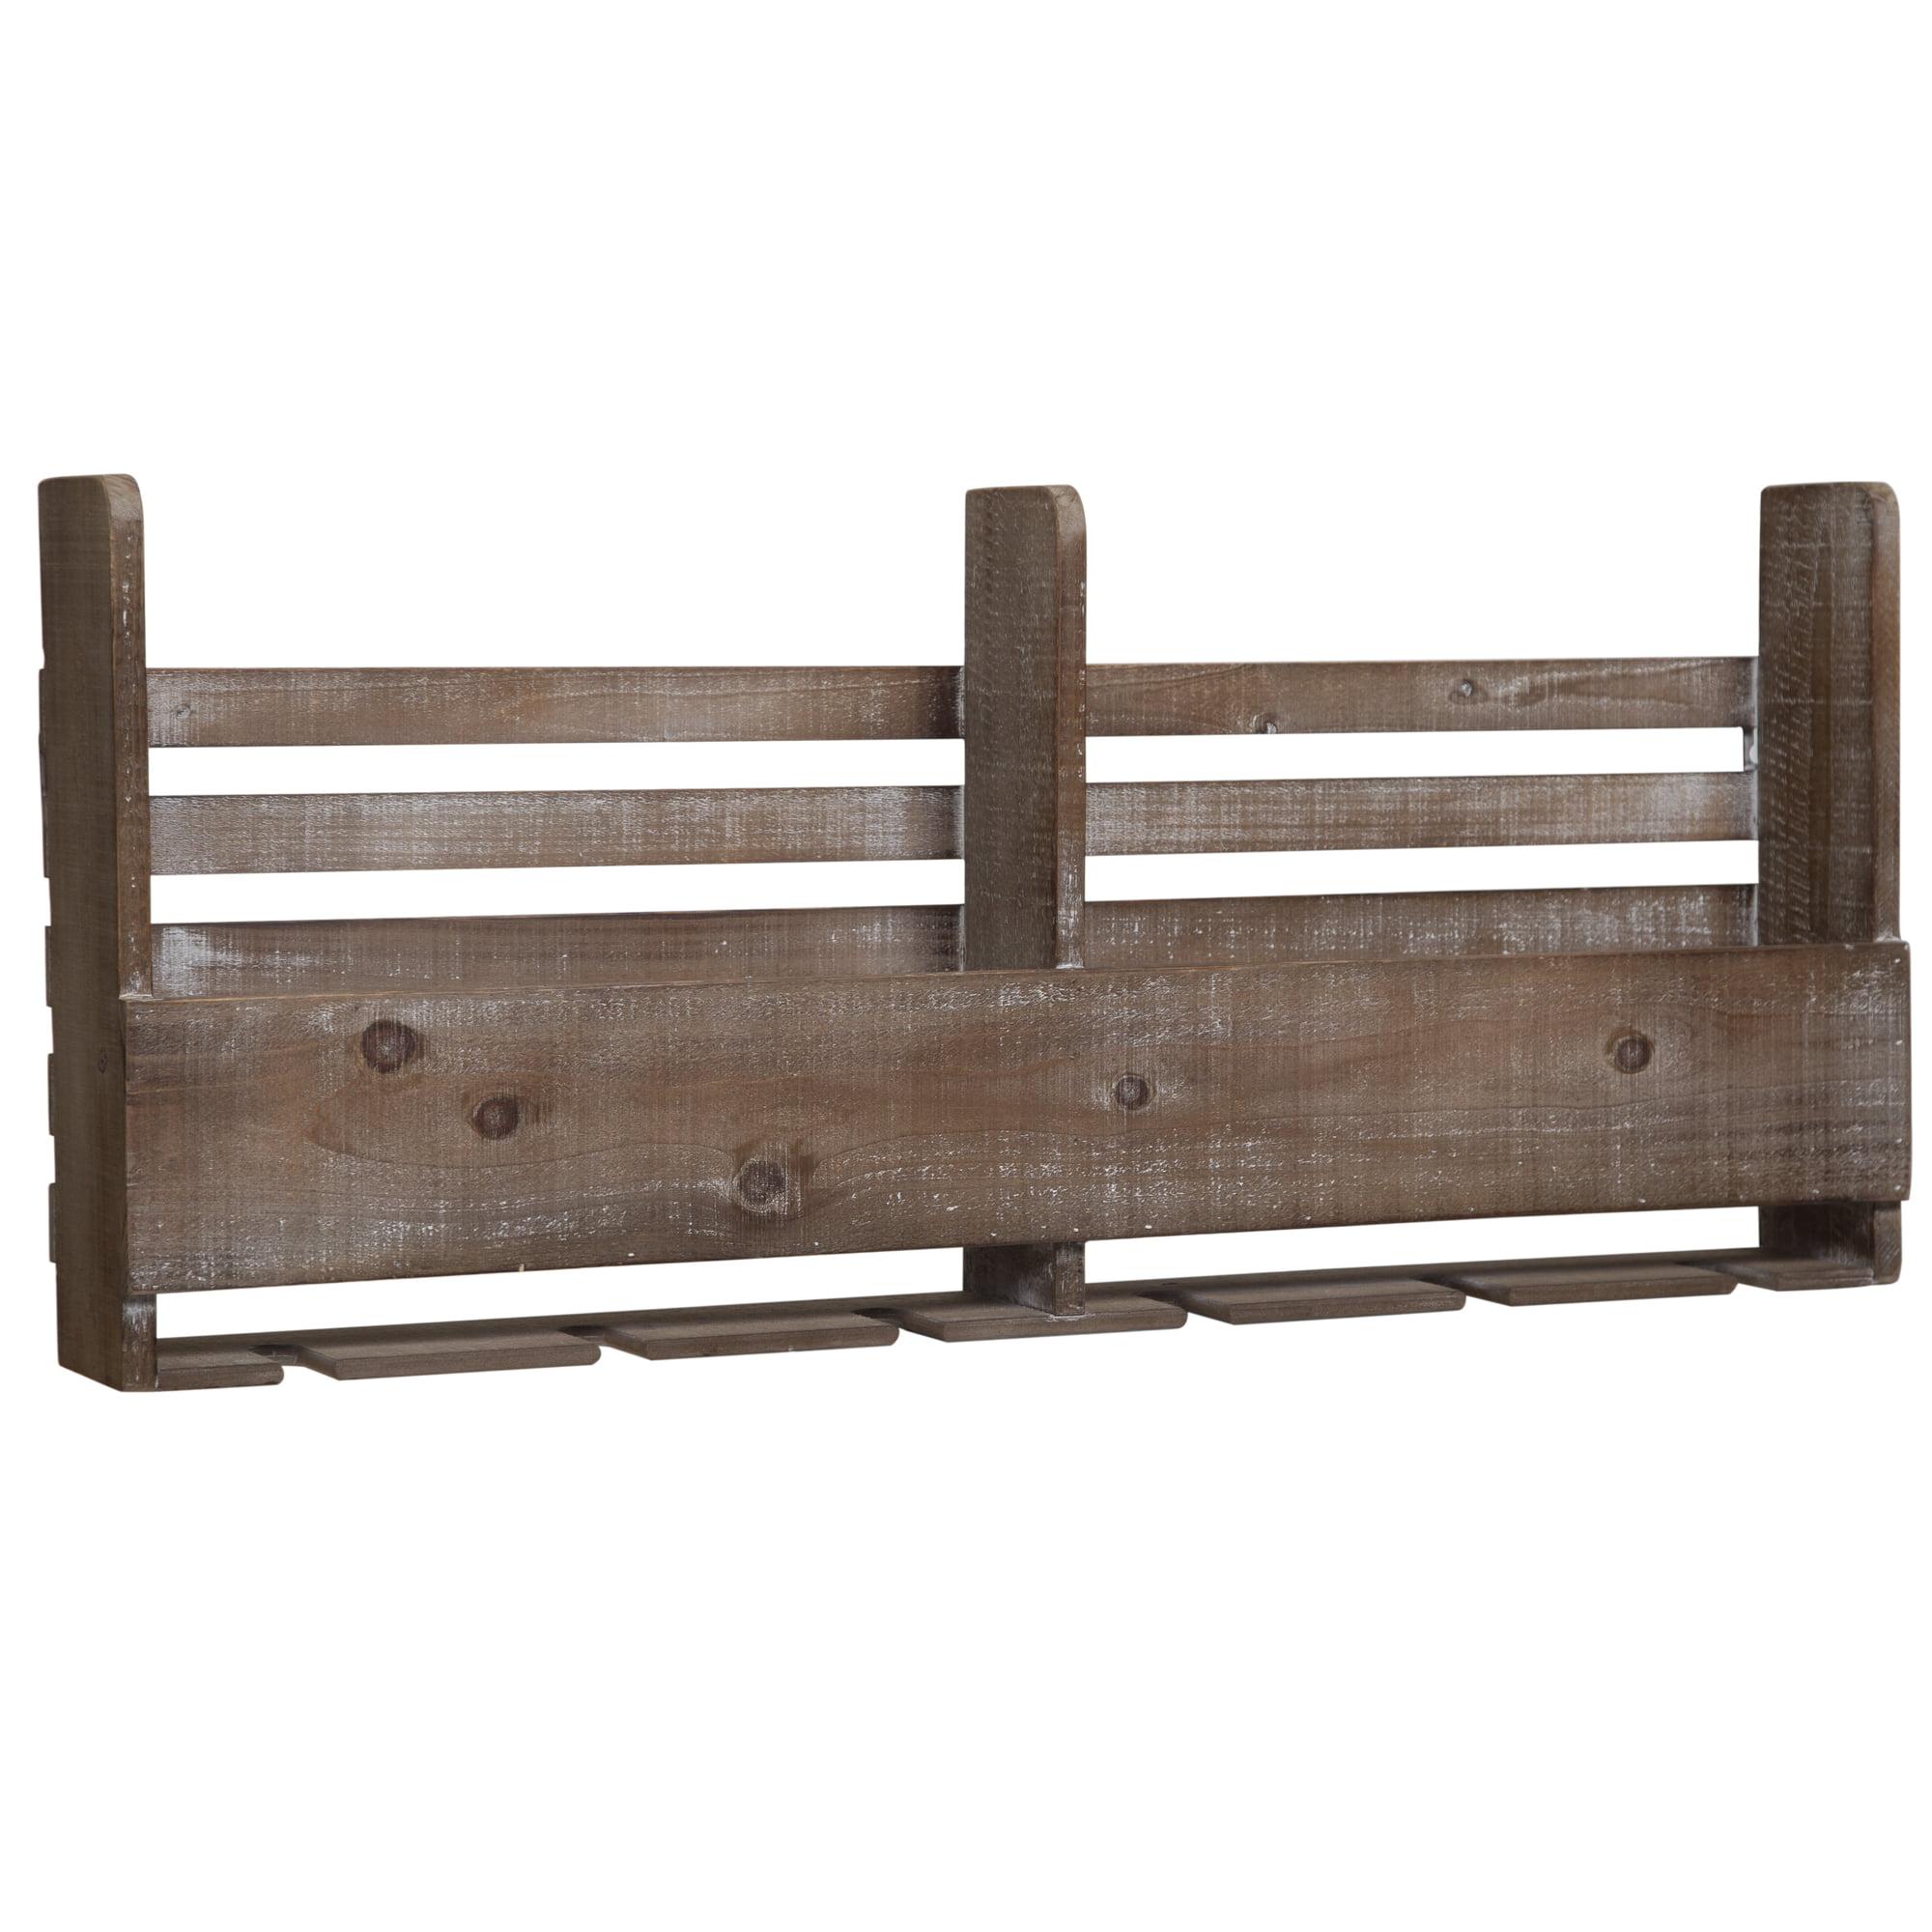 Gallery Solutions Reclaimed Wood Pallet Wine Rack   Walmart.com